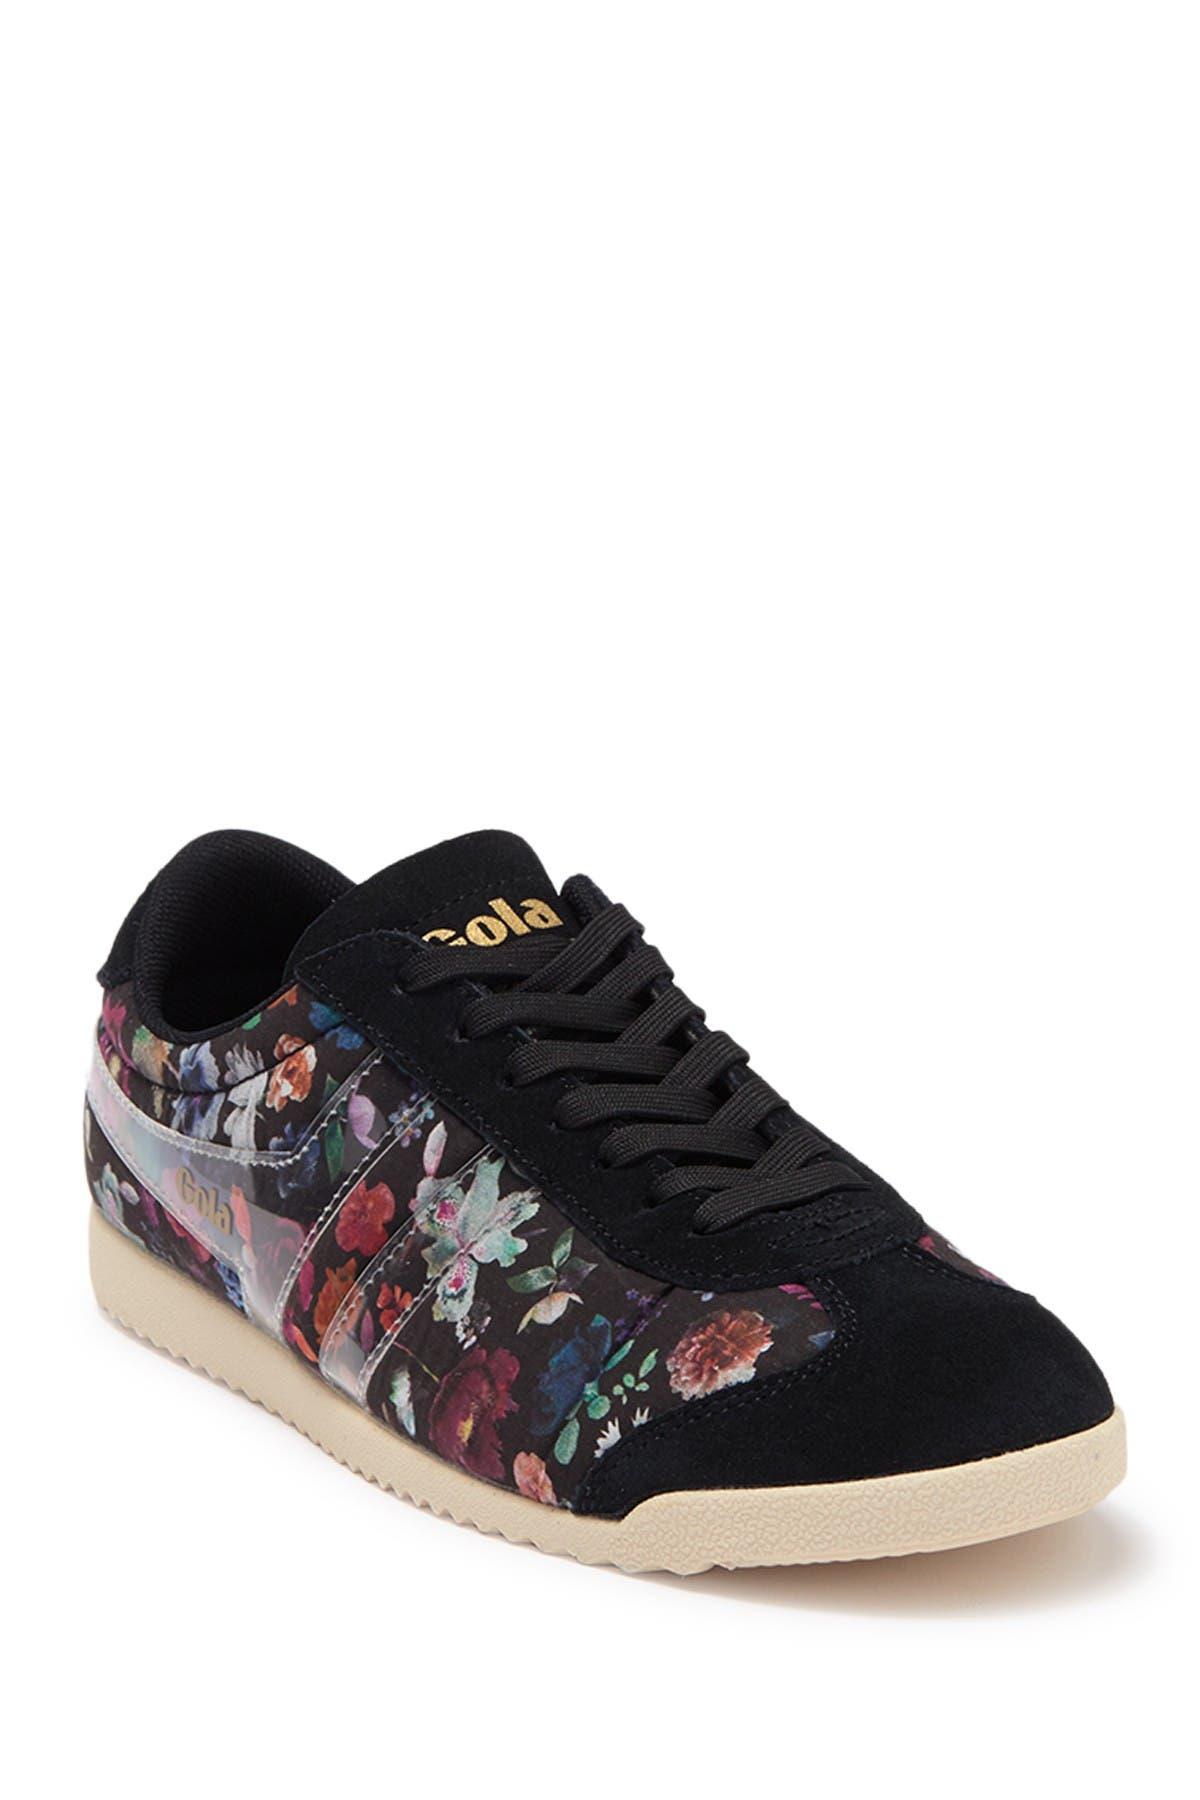 Image of Gola Bullet Liberty Floral Sneaker